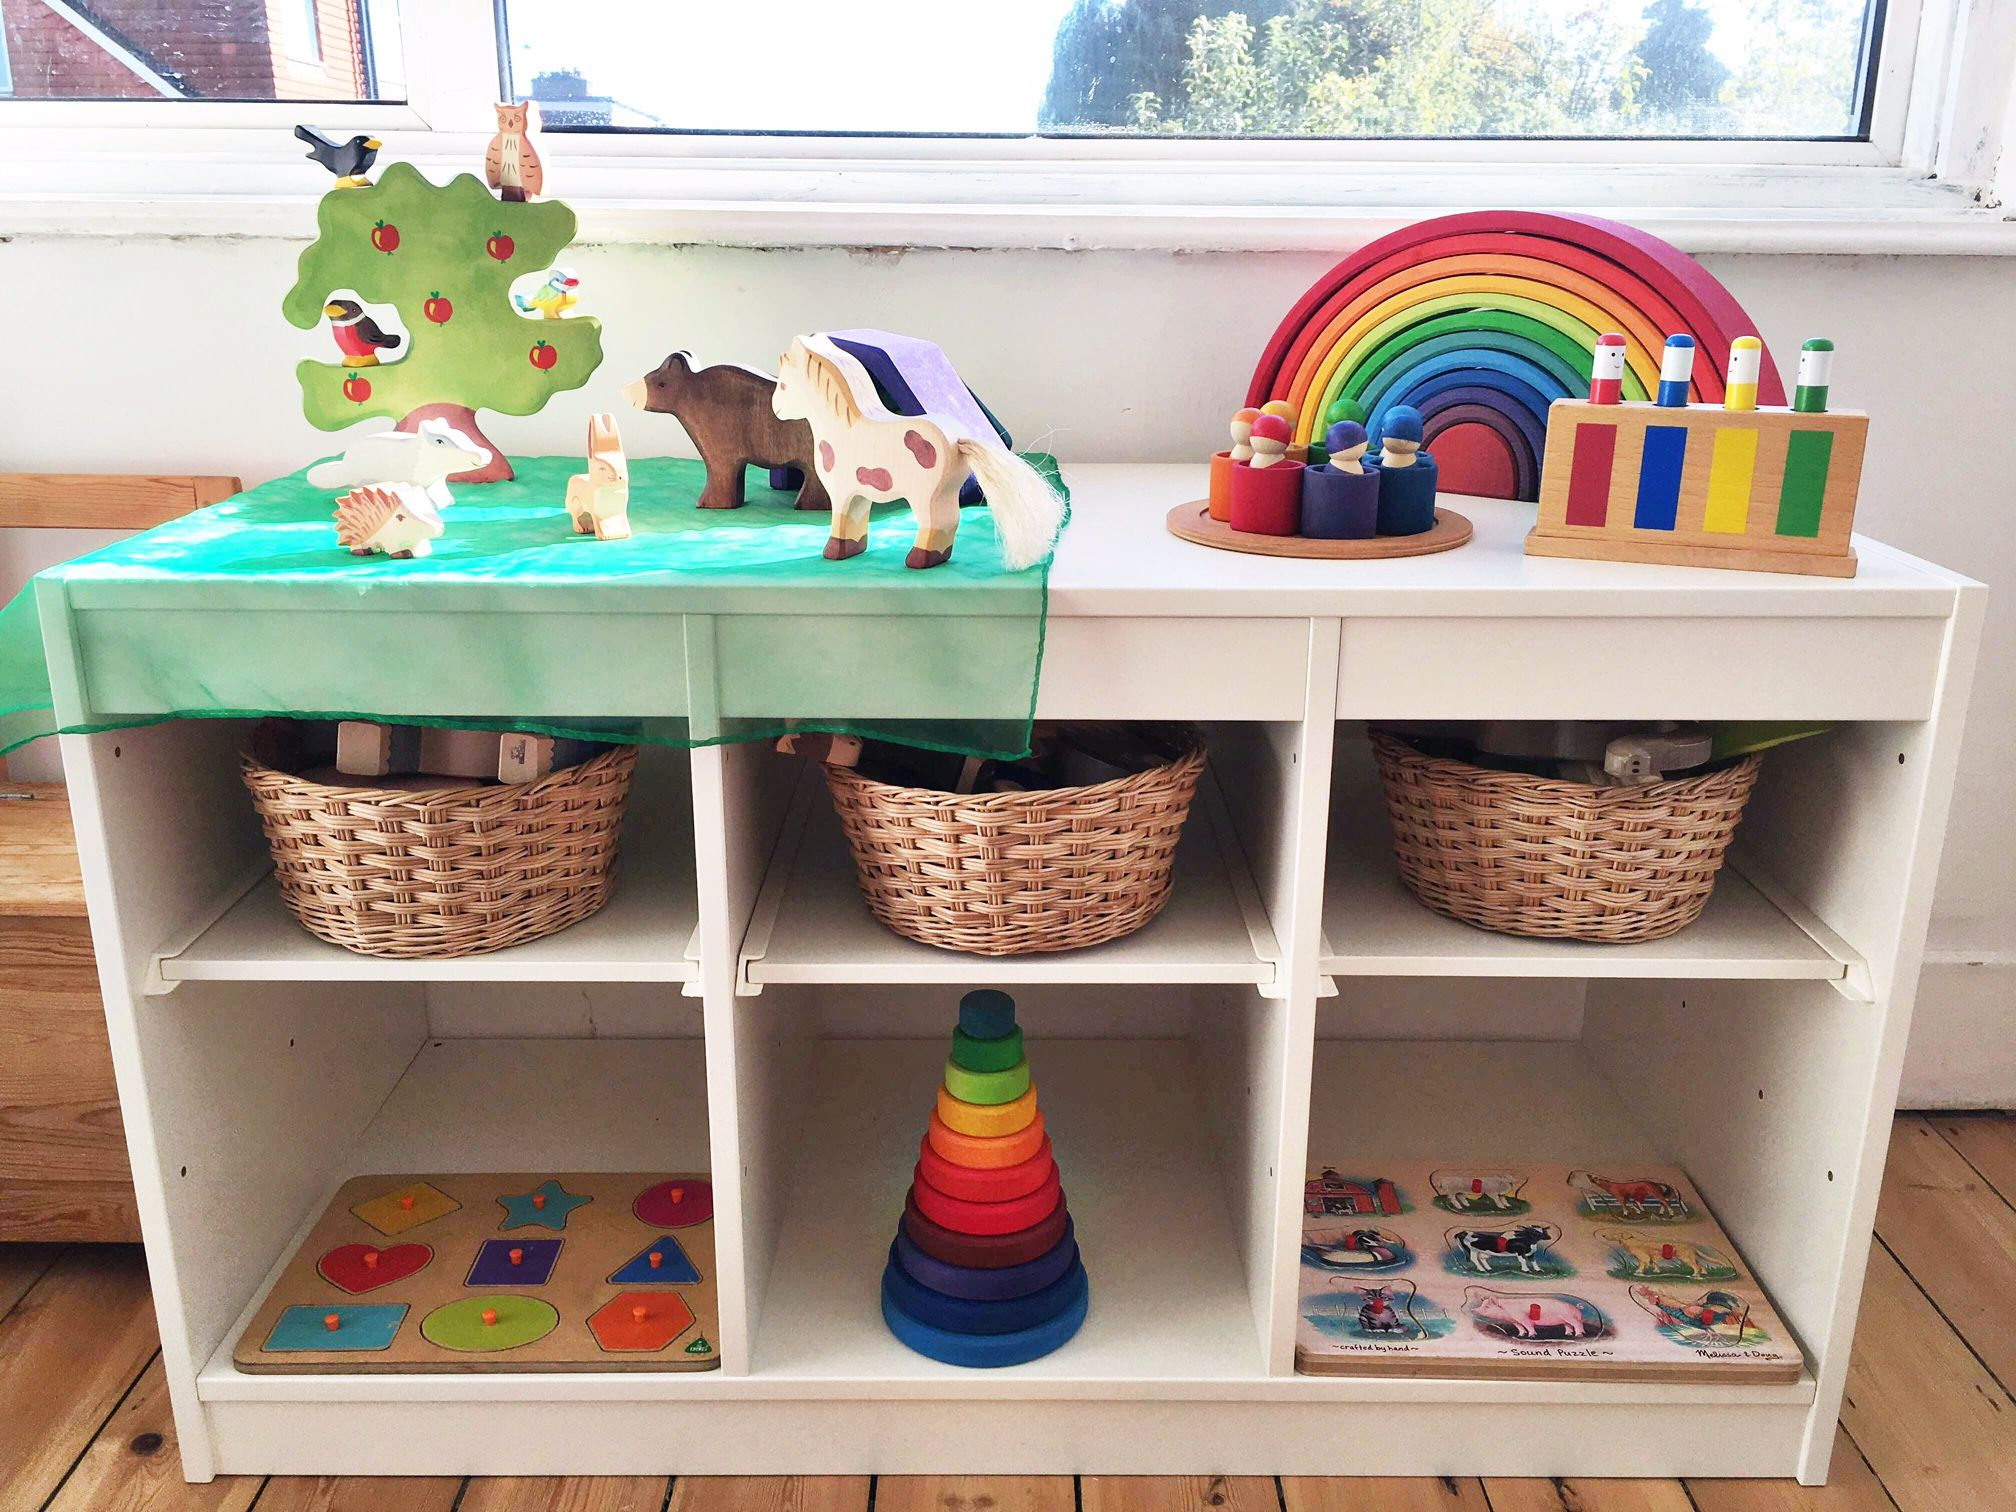 A Peek Inside Eloise Sam And Frida S Montessori Style Home In London The Montessori Notebook Minimalist Kids Room Montessori Playroom Montessori Room